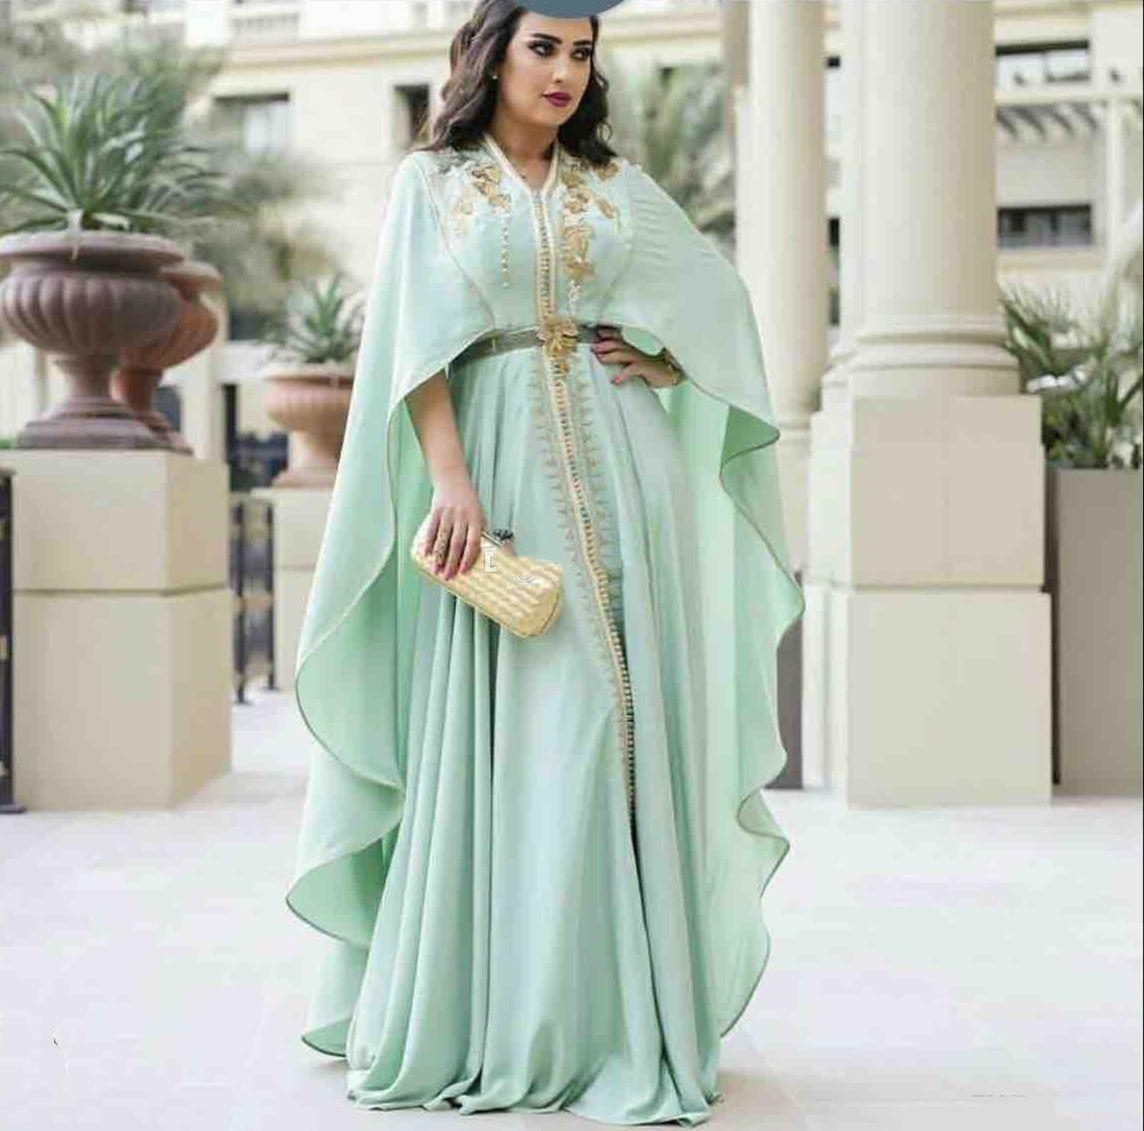 2021 Menthe Green Kaftan Robes de bal Cape manches longues avec dentelle de dentelle de broderie en or